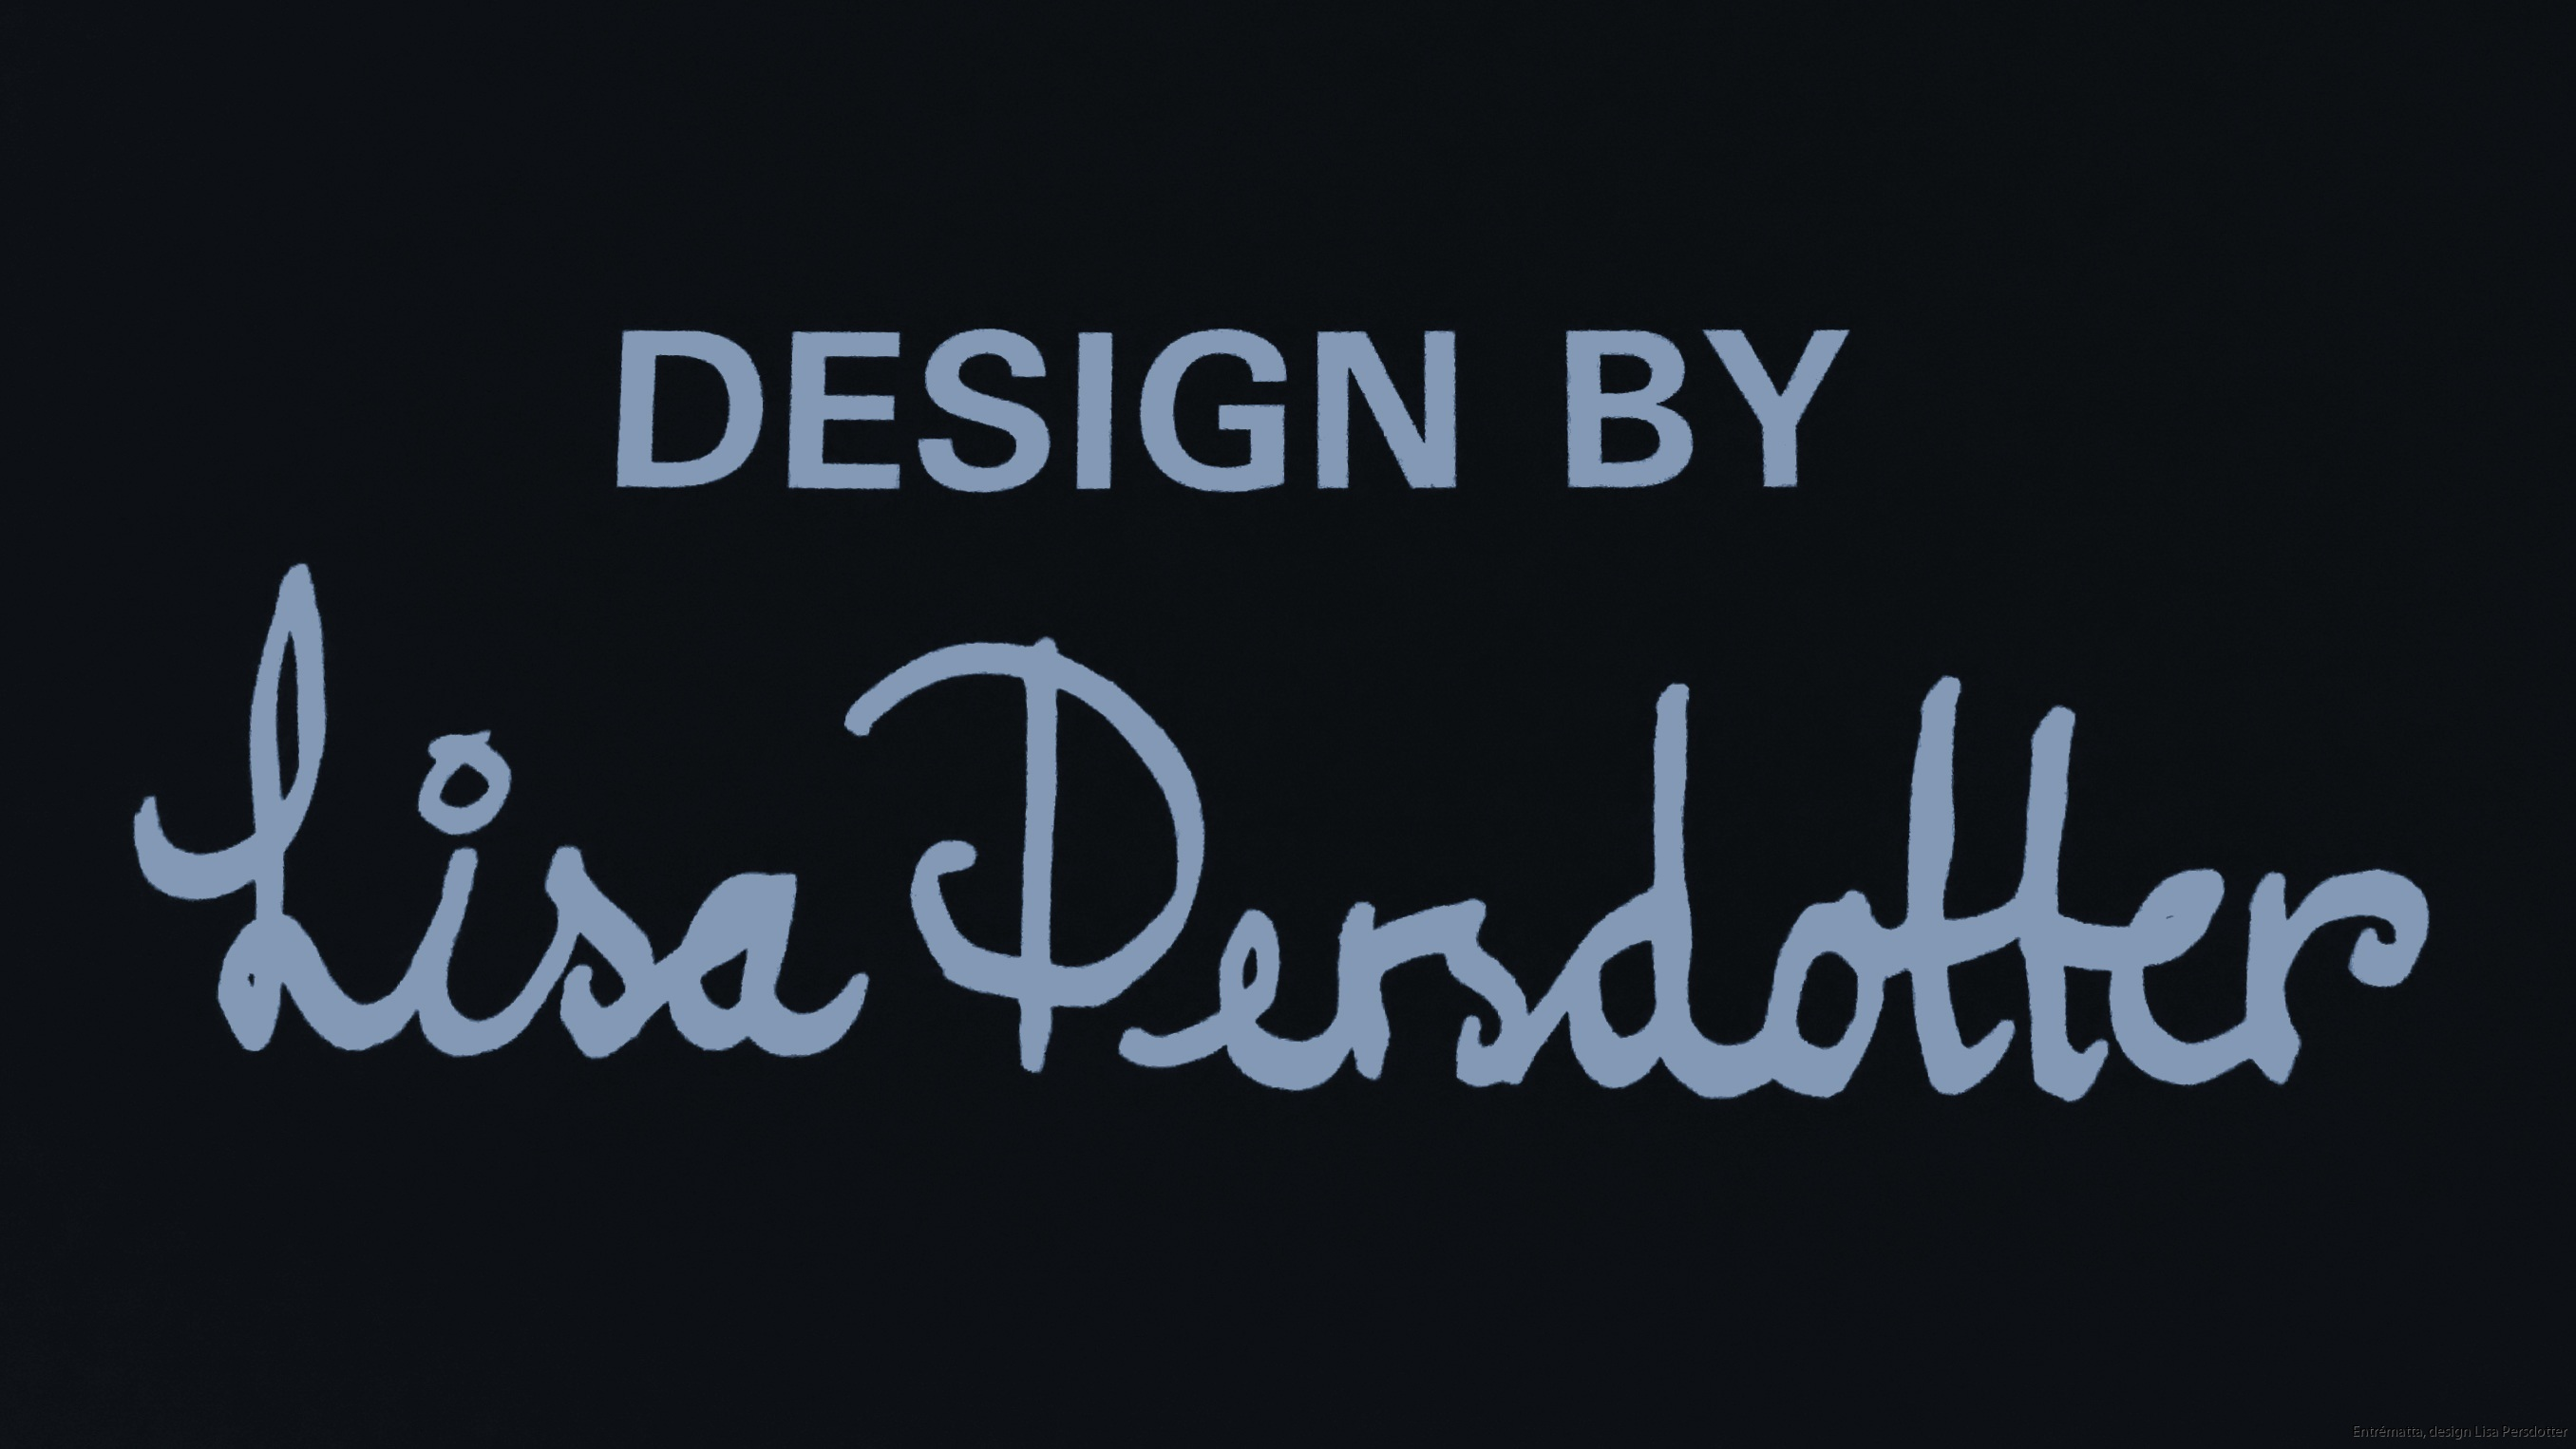 Design Lisa Persdotter kopiera